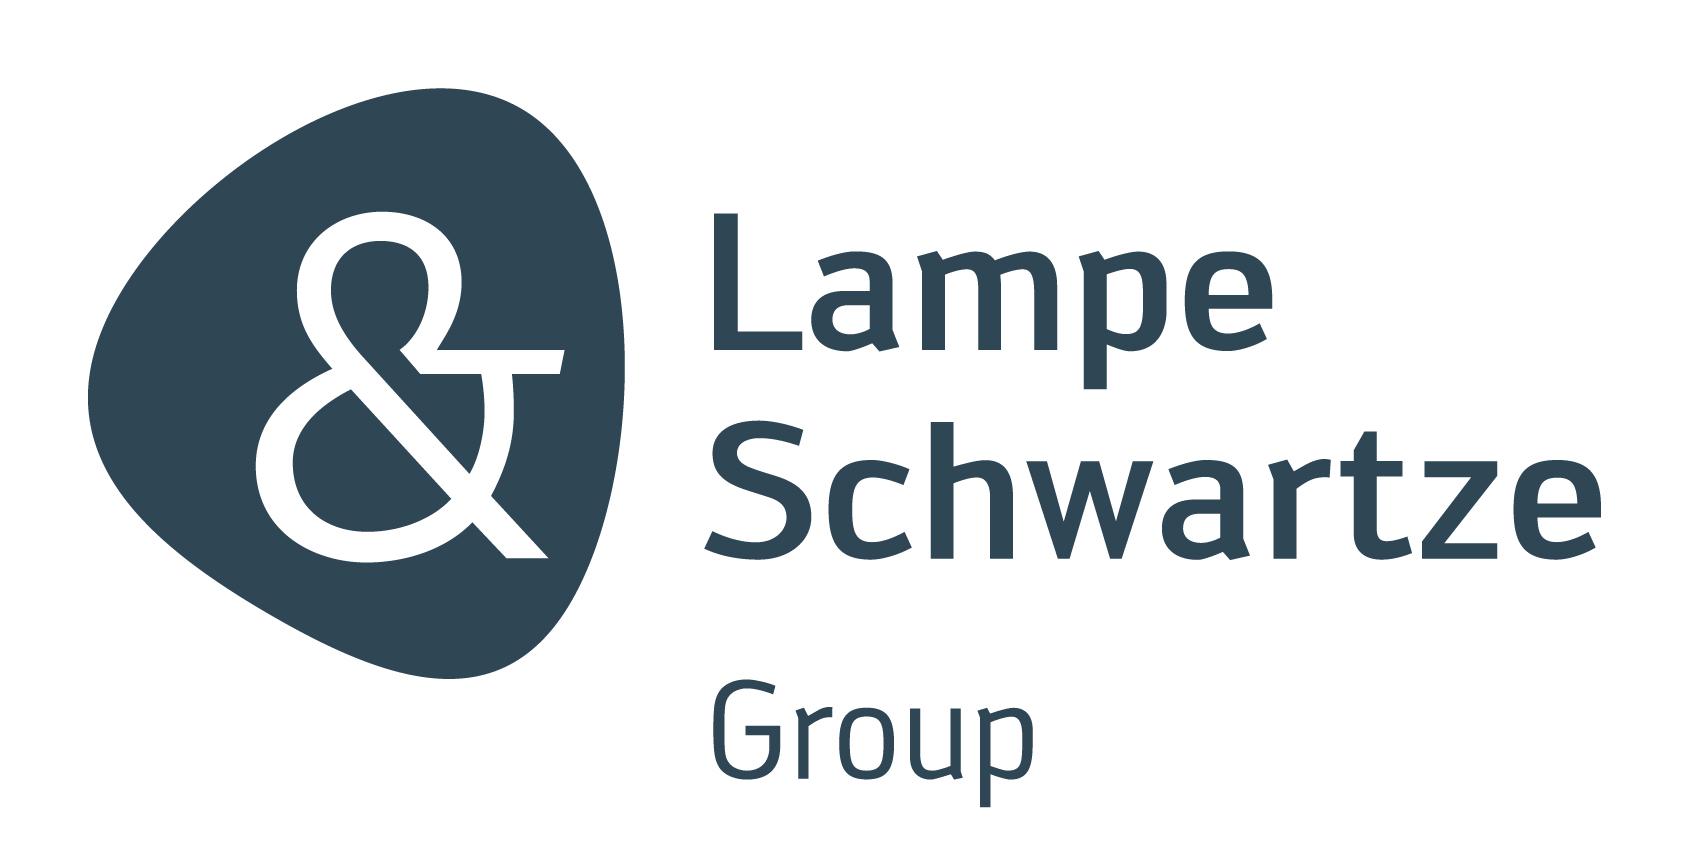 mitglieder-logos/1000000772_LS_Group_rgb.png